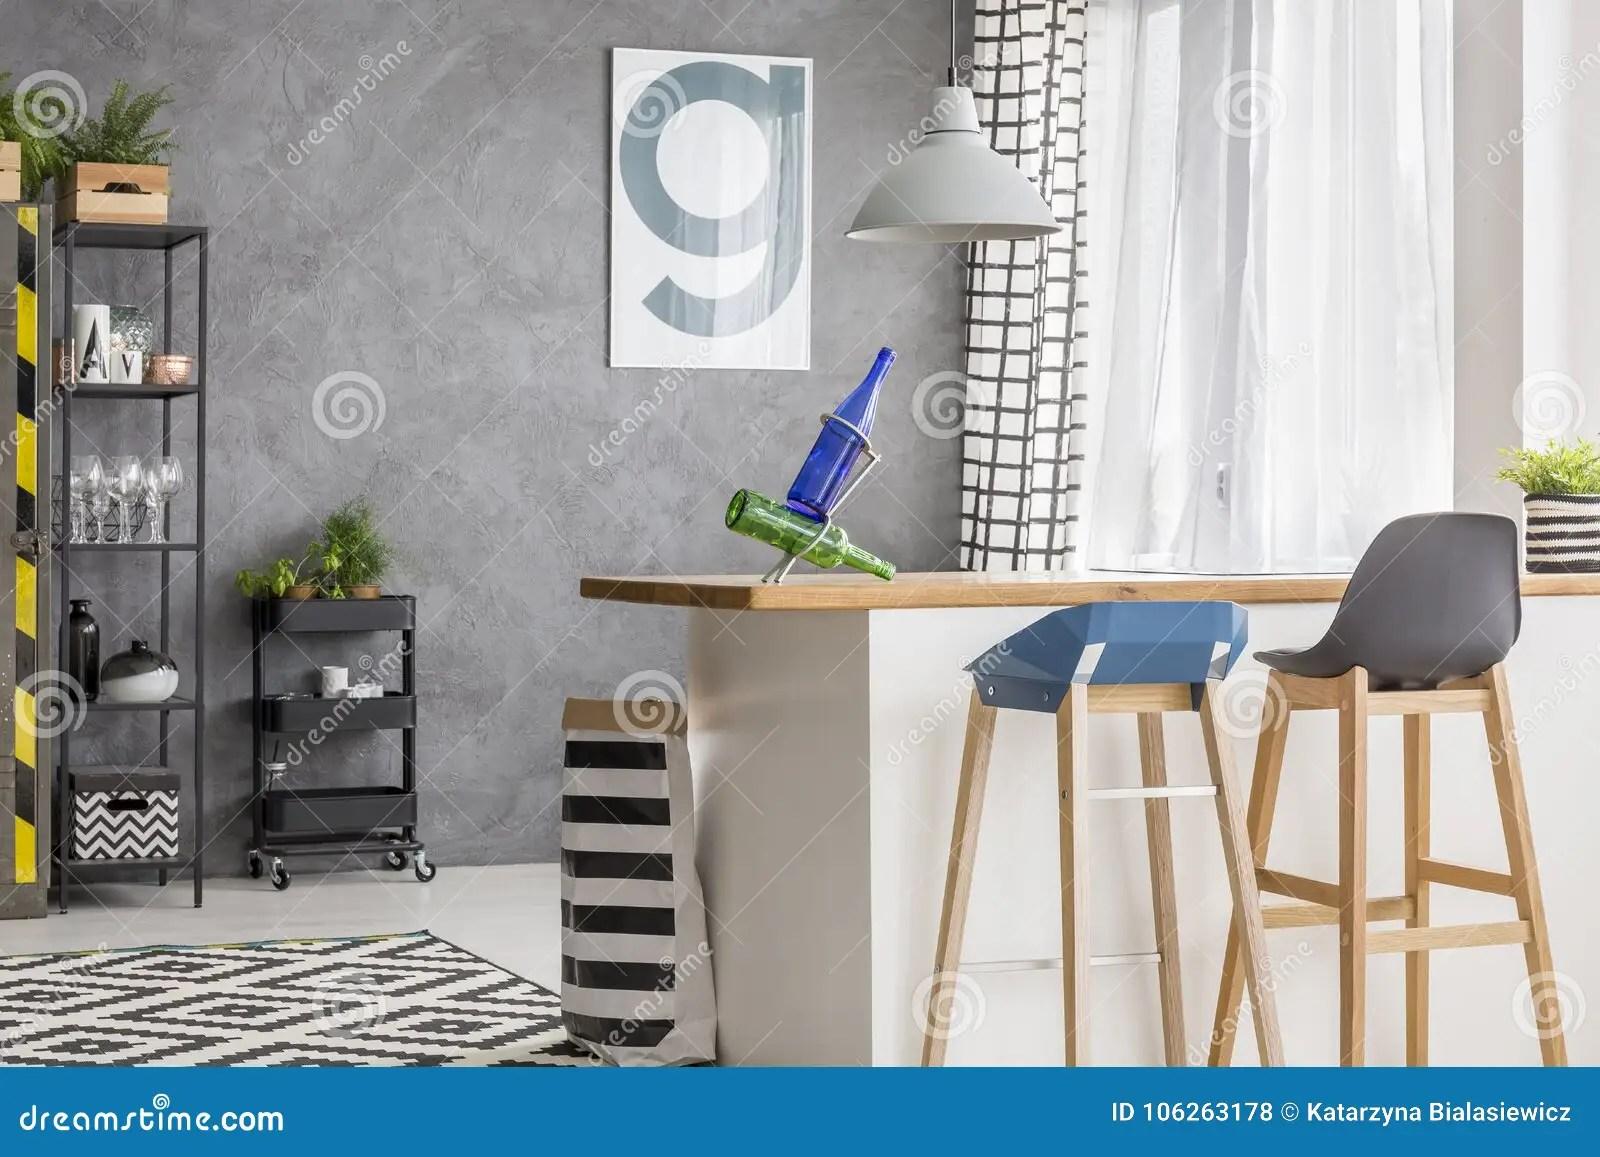 framed prints for kitchens bench kitchen table 有海报和凳子的厨房库存照片 图片包括有任何地方 海报 灰色 淡色 闪 有海报和凳子的厨房